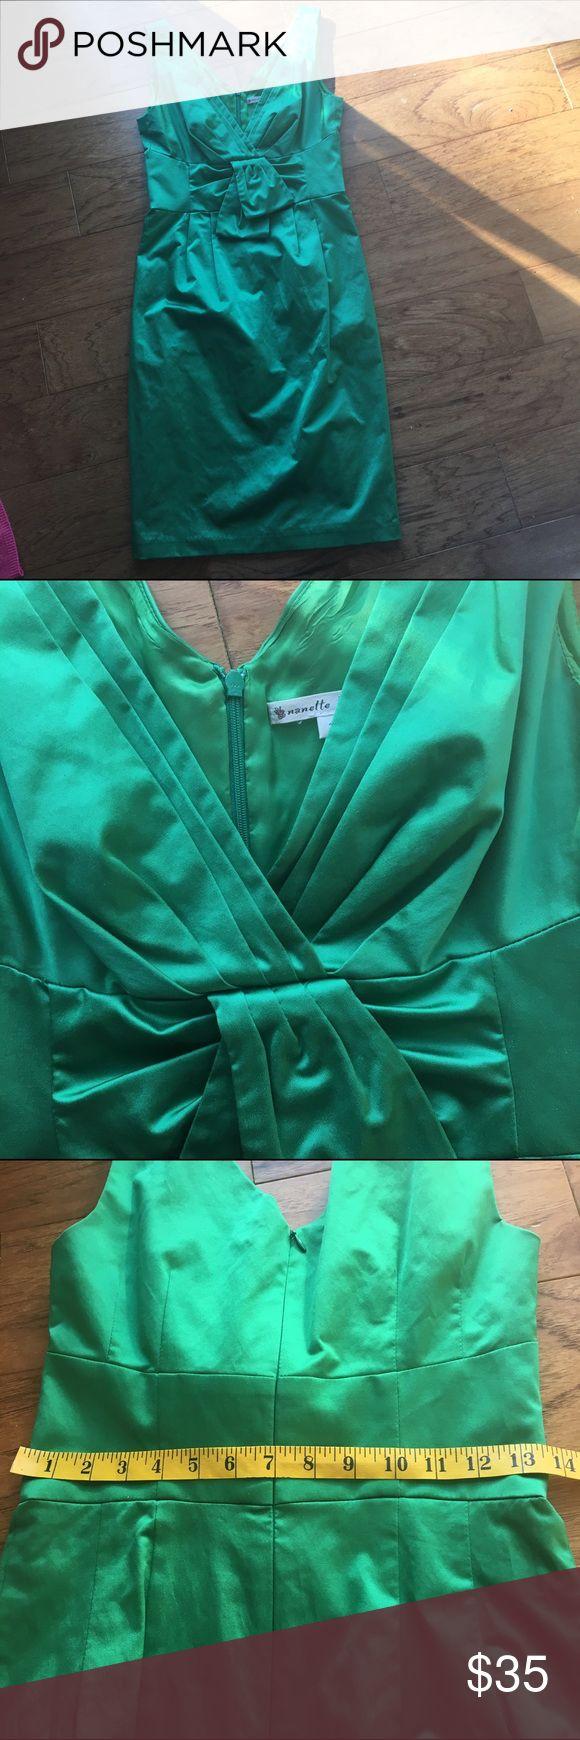 Nanette Lepore green  shift dress midi St Pat sz 2 Great pre owned condition midi lined sz 2 vivid green great for st Patrick day Nanette Lepore Dresses Midi